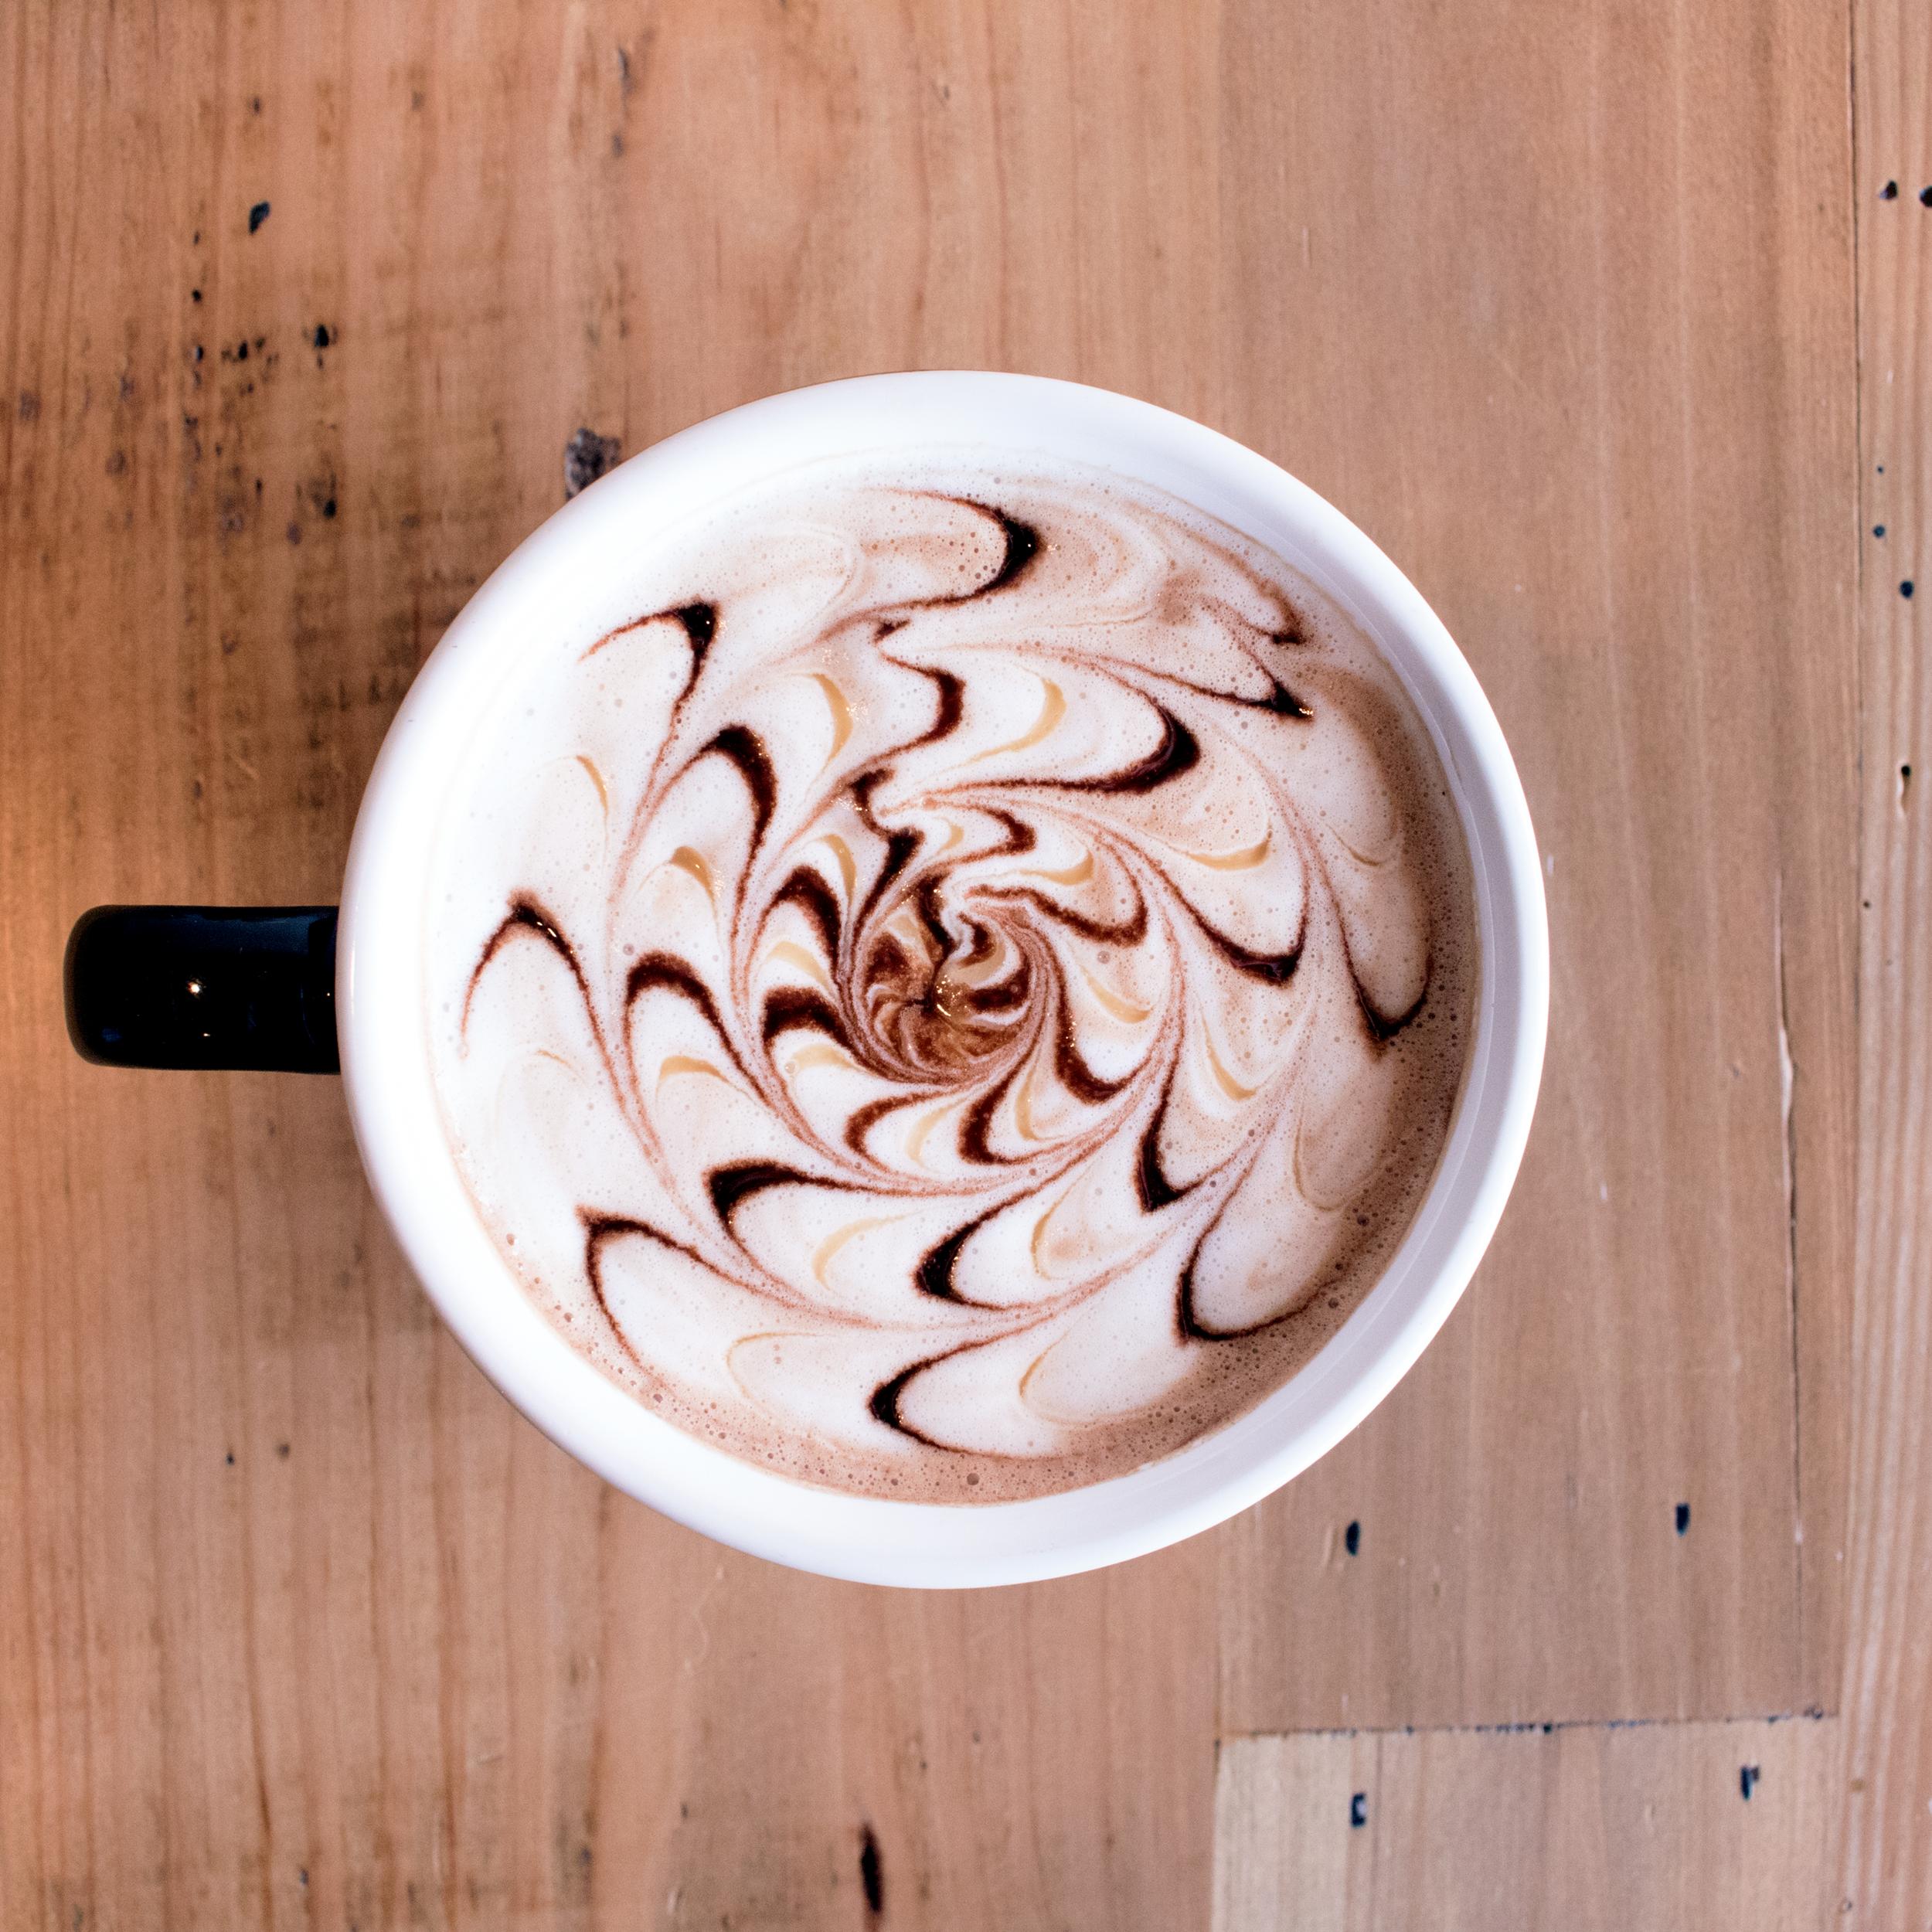 Caramel Mocha - Espresso + Chocolate + Caramel + Milk